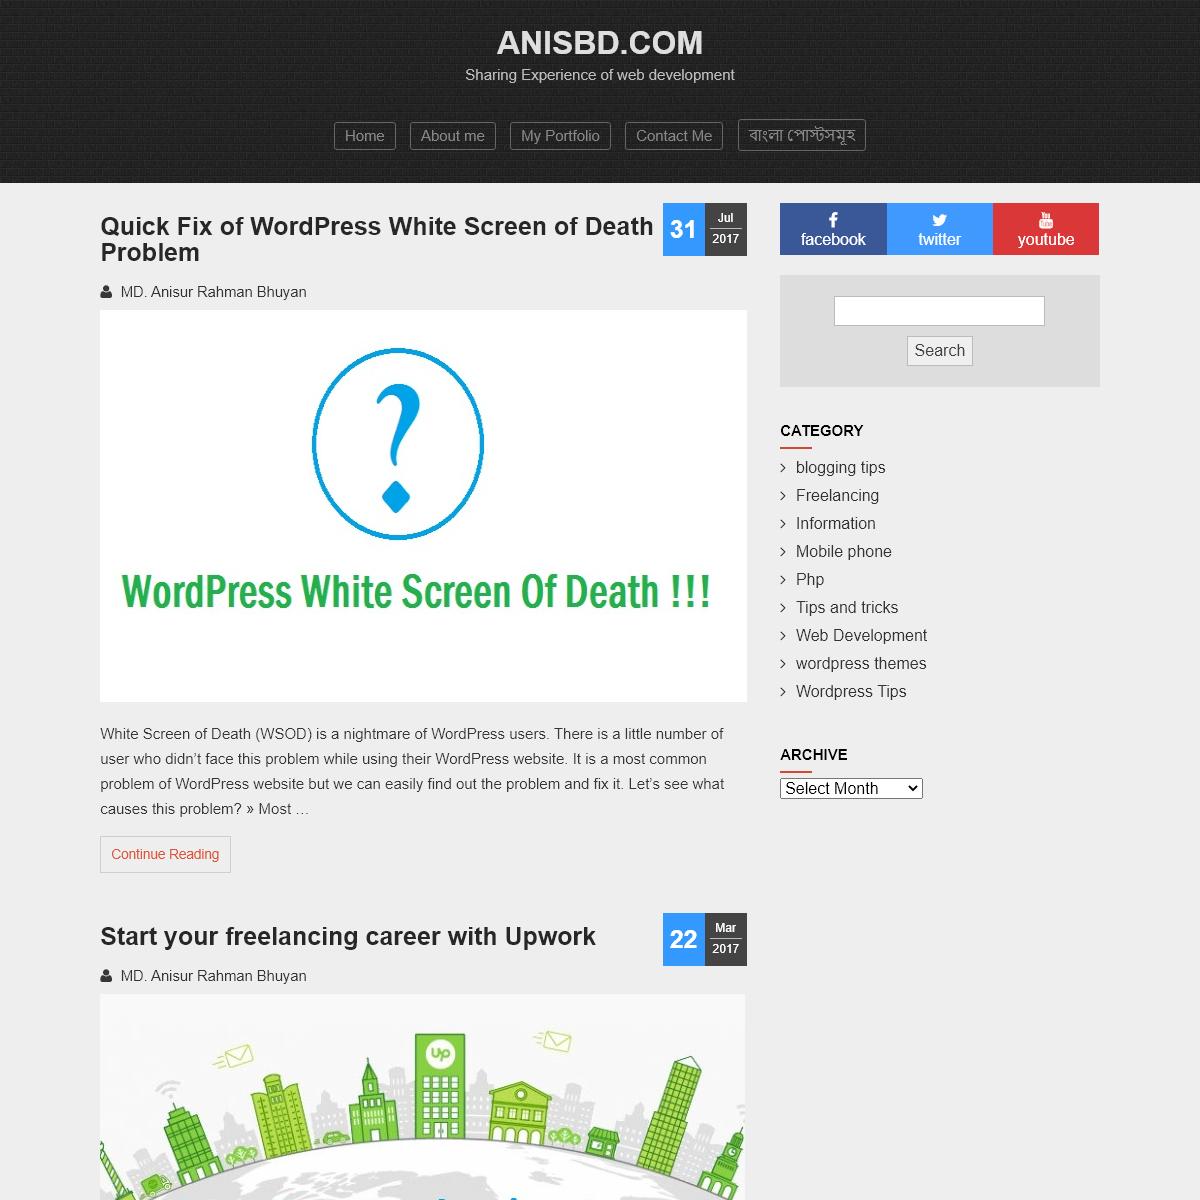 MD. Anisur Rahman Bhuyan – Sharing Experience of web development